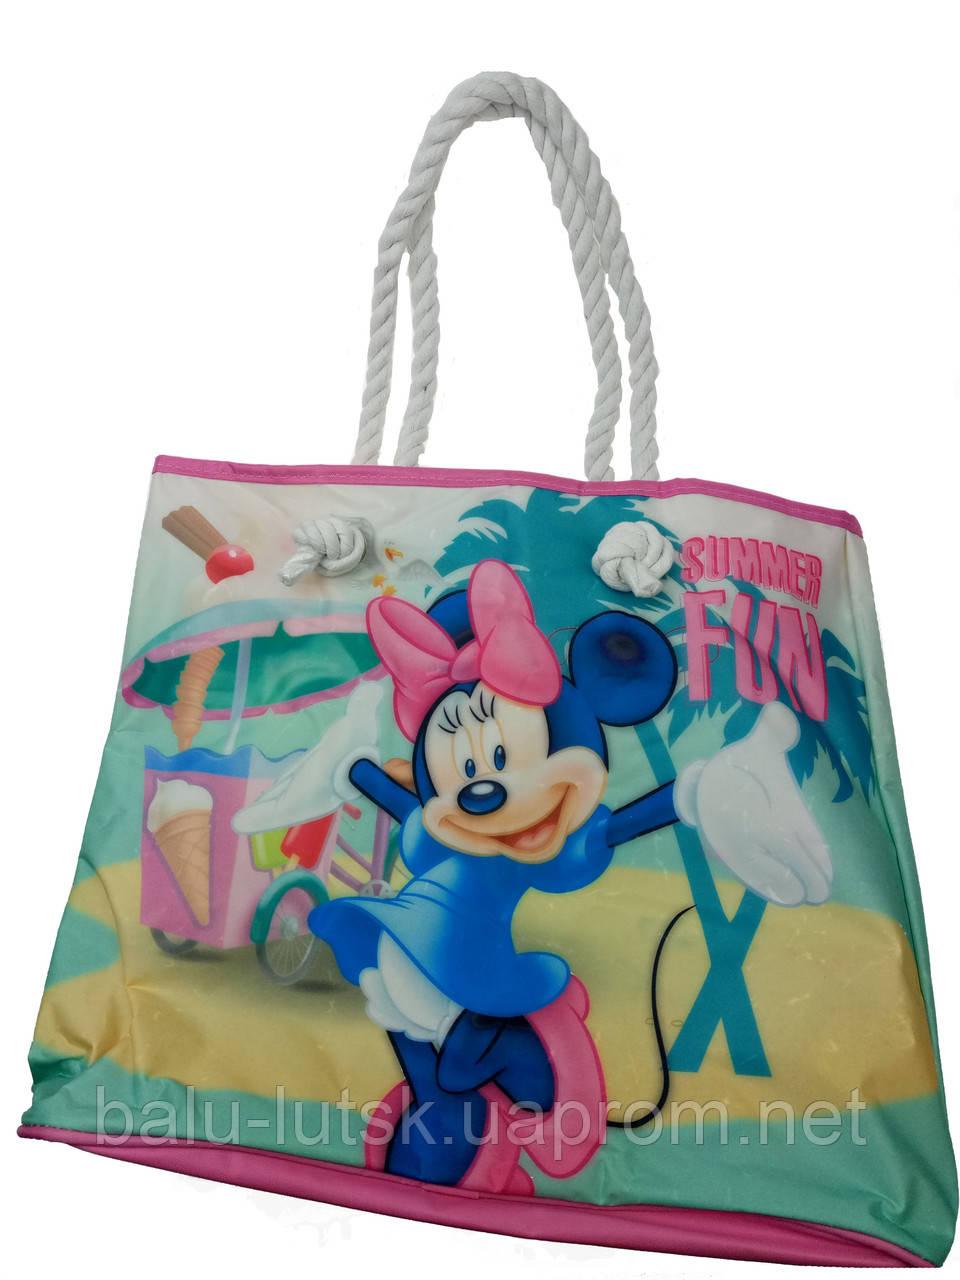 090d86c68fff Детская сумка для девочки MINNIE MOUSE , цена 160 грн., купить в Луцке —  Prom.ua (ID#645451408)